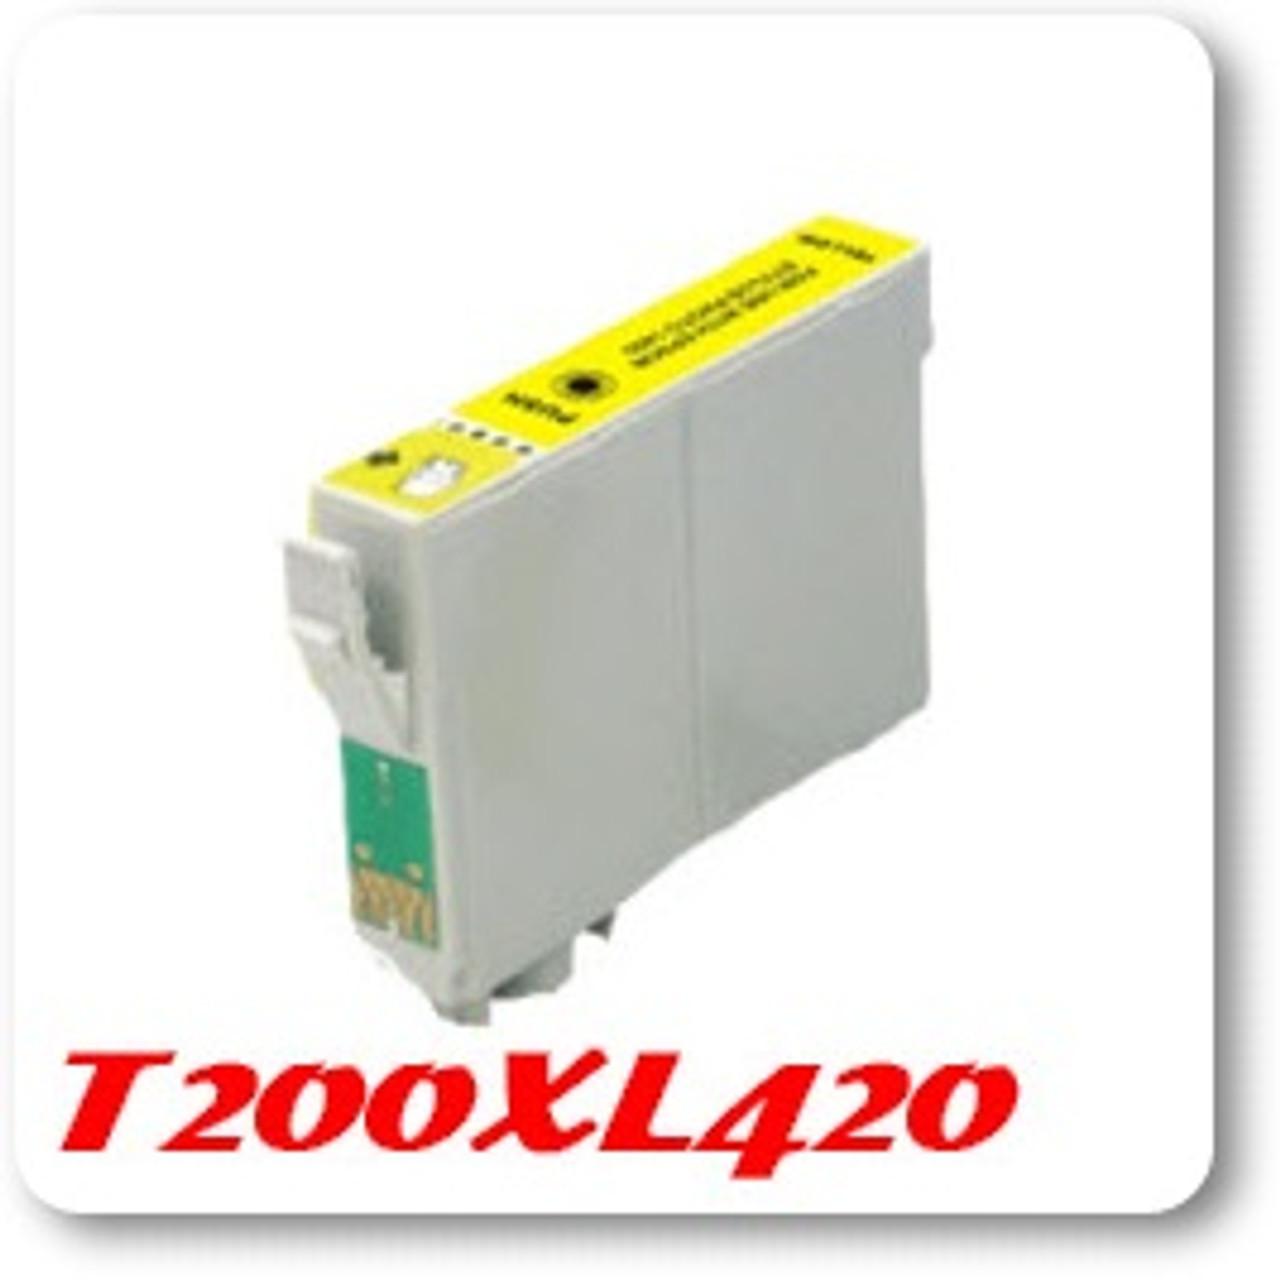 T200XL420 Compatible Ink Cartridge